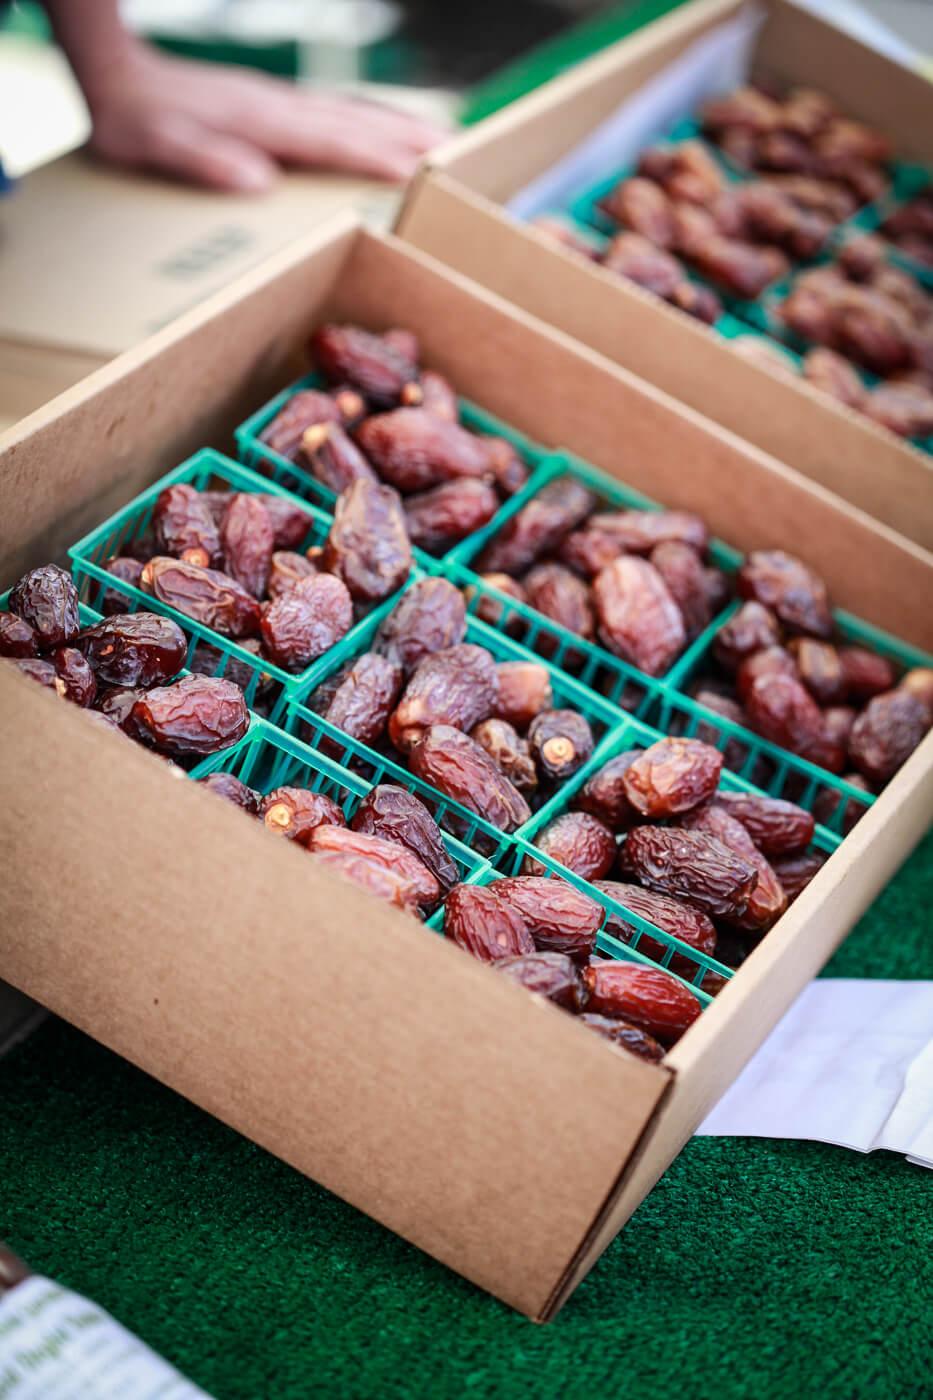 A photo of fresh California Medjool dates sold at a farmers market.